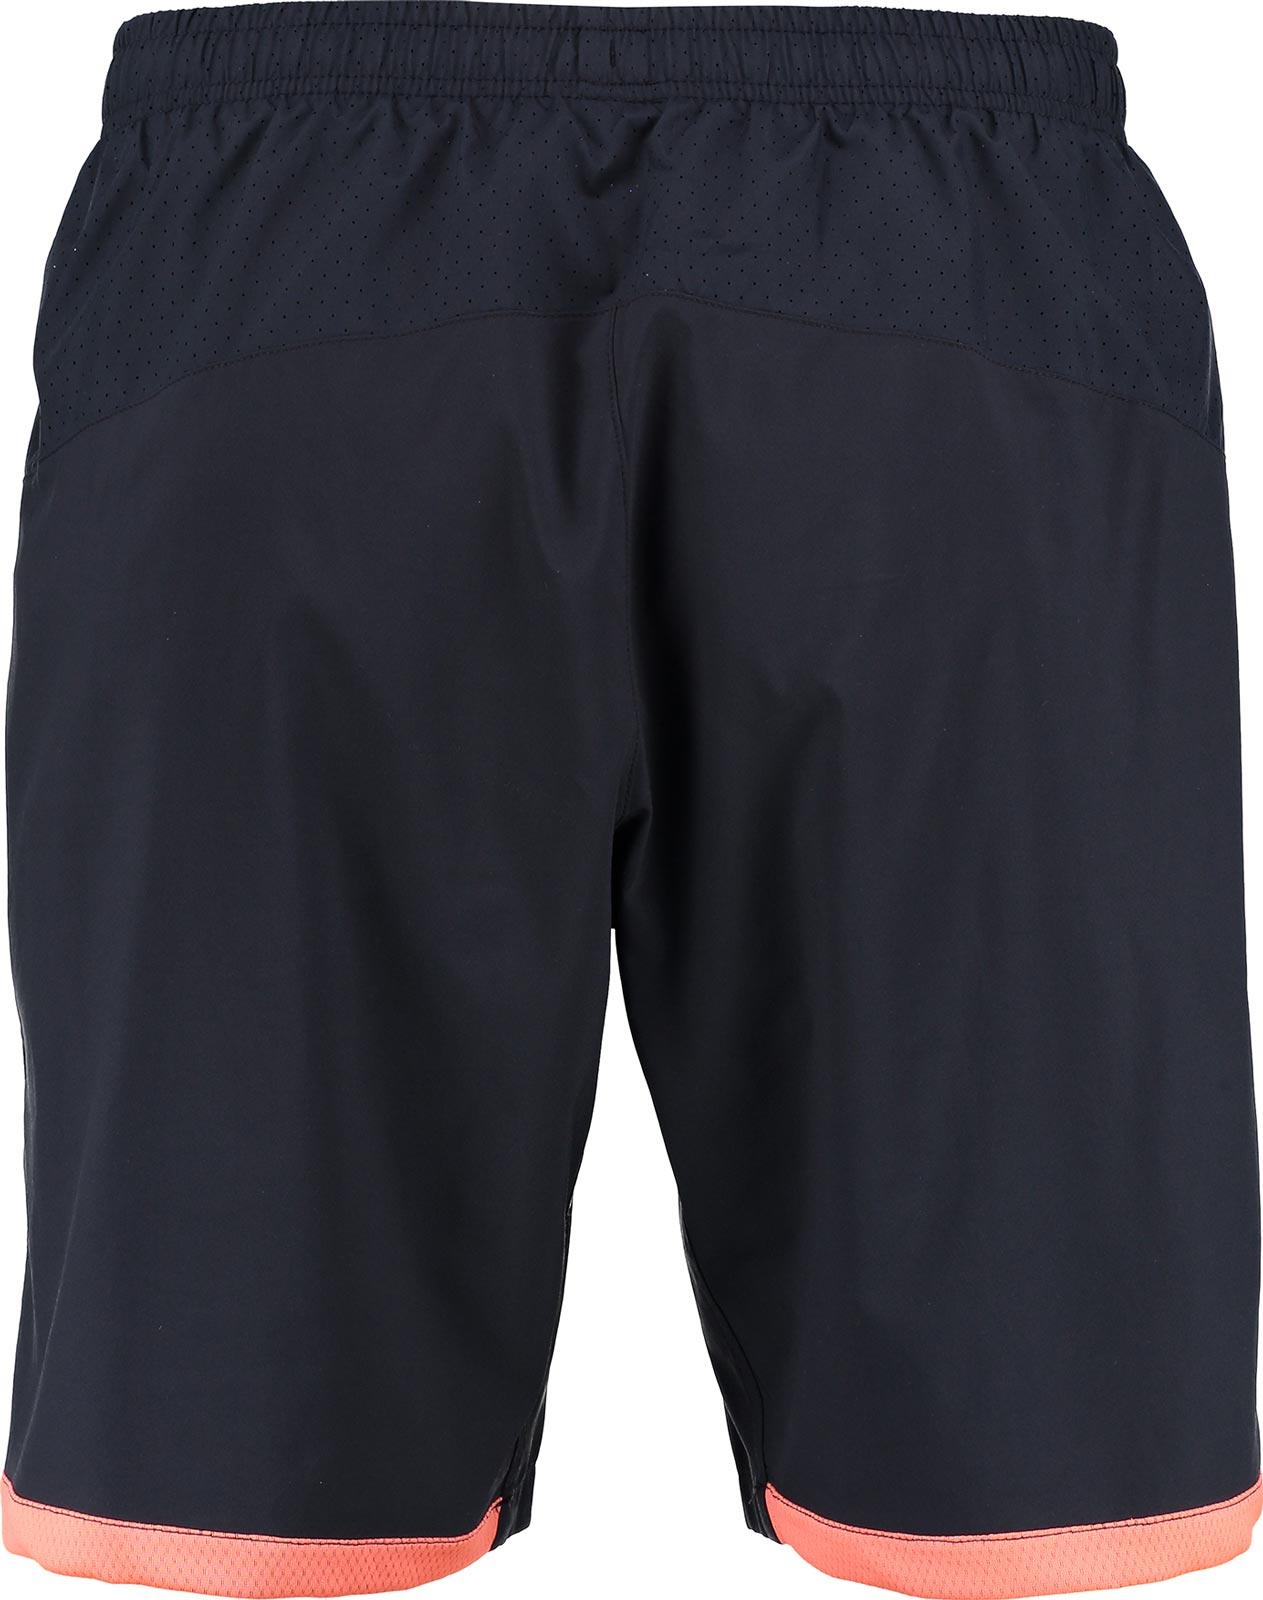 everton-16-17-away-kit-shorts-back